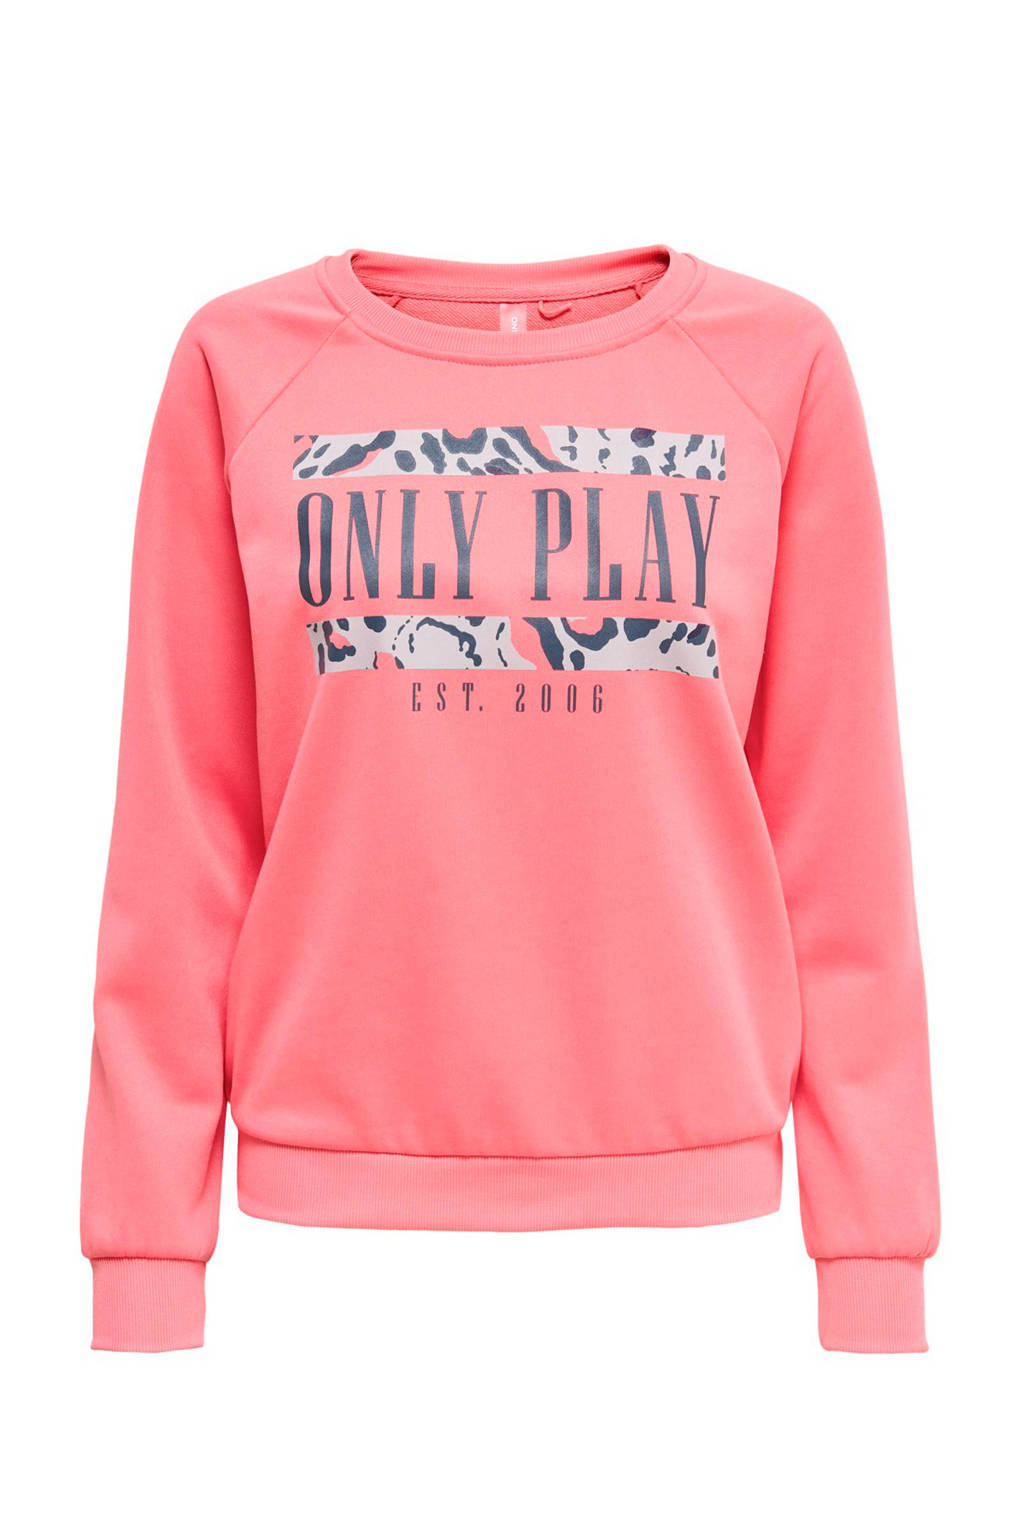 ONLY PLAY sportsweater roze, Roze